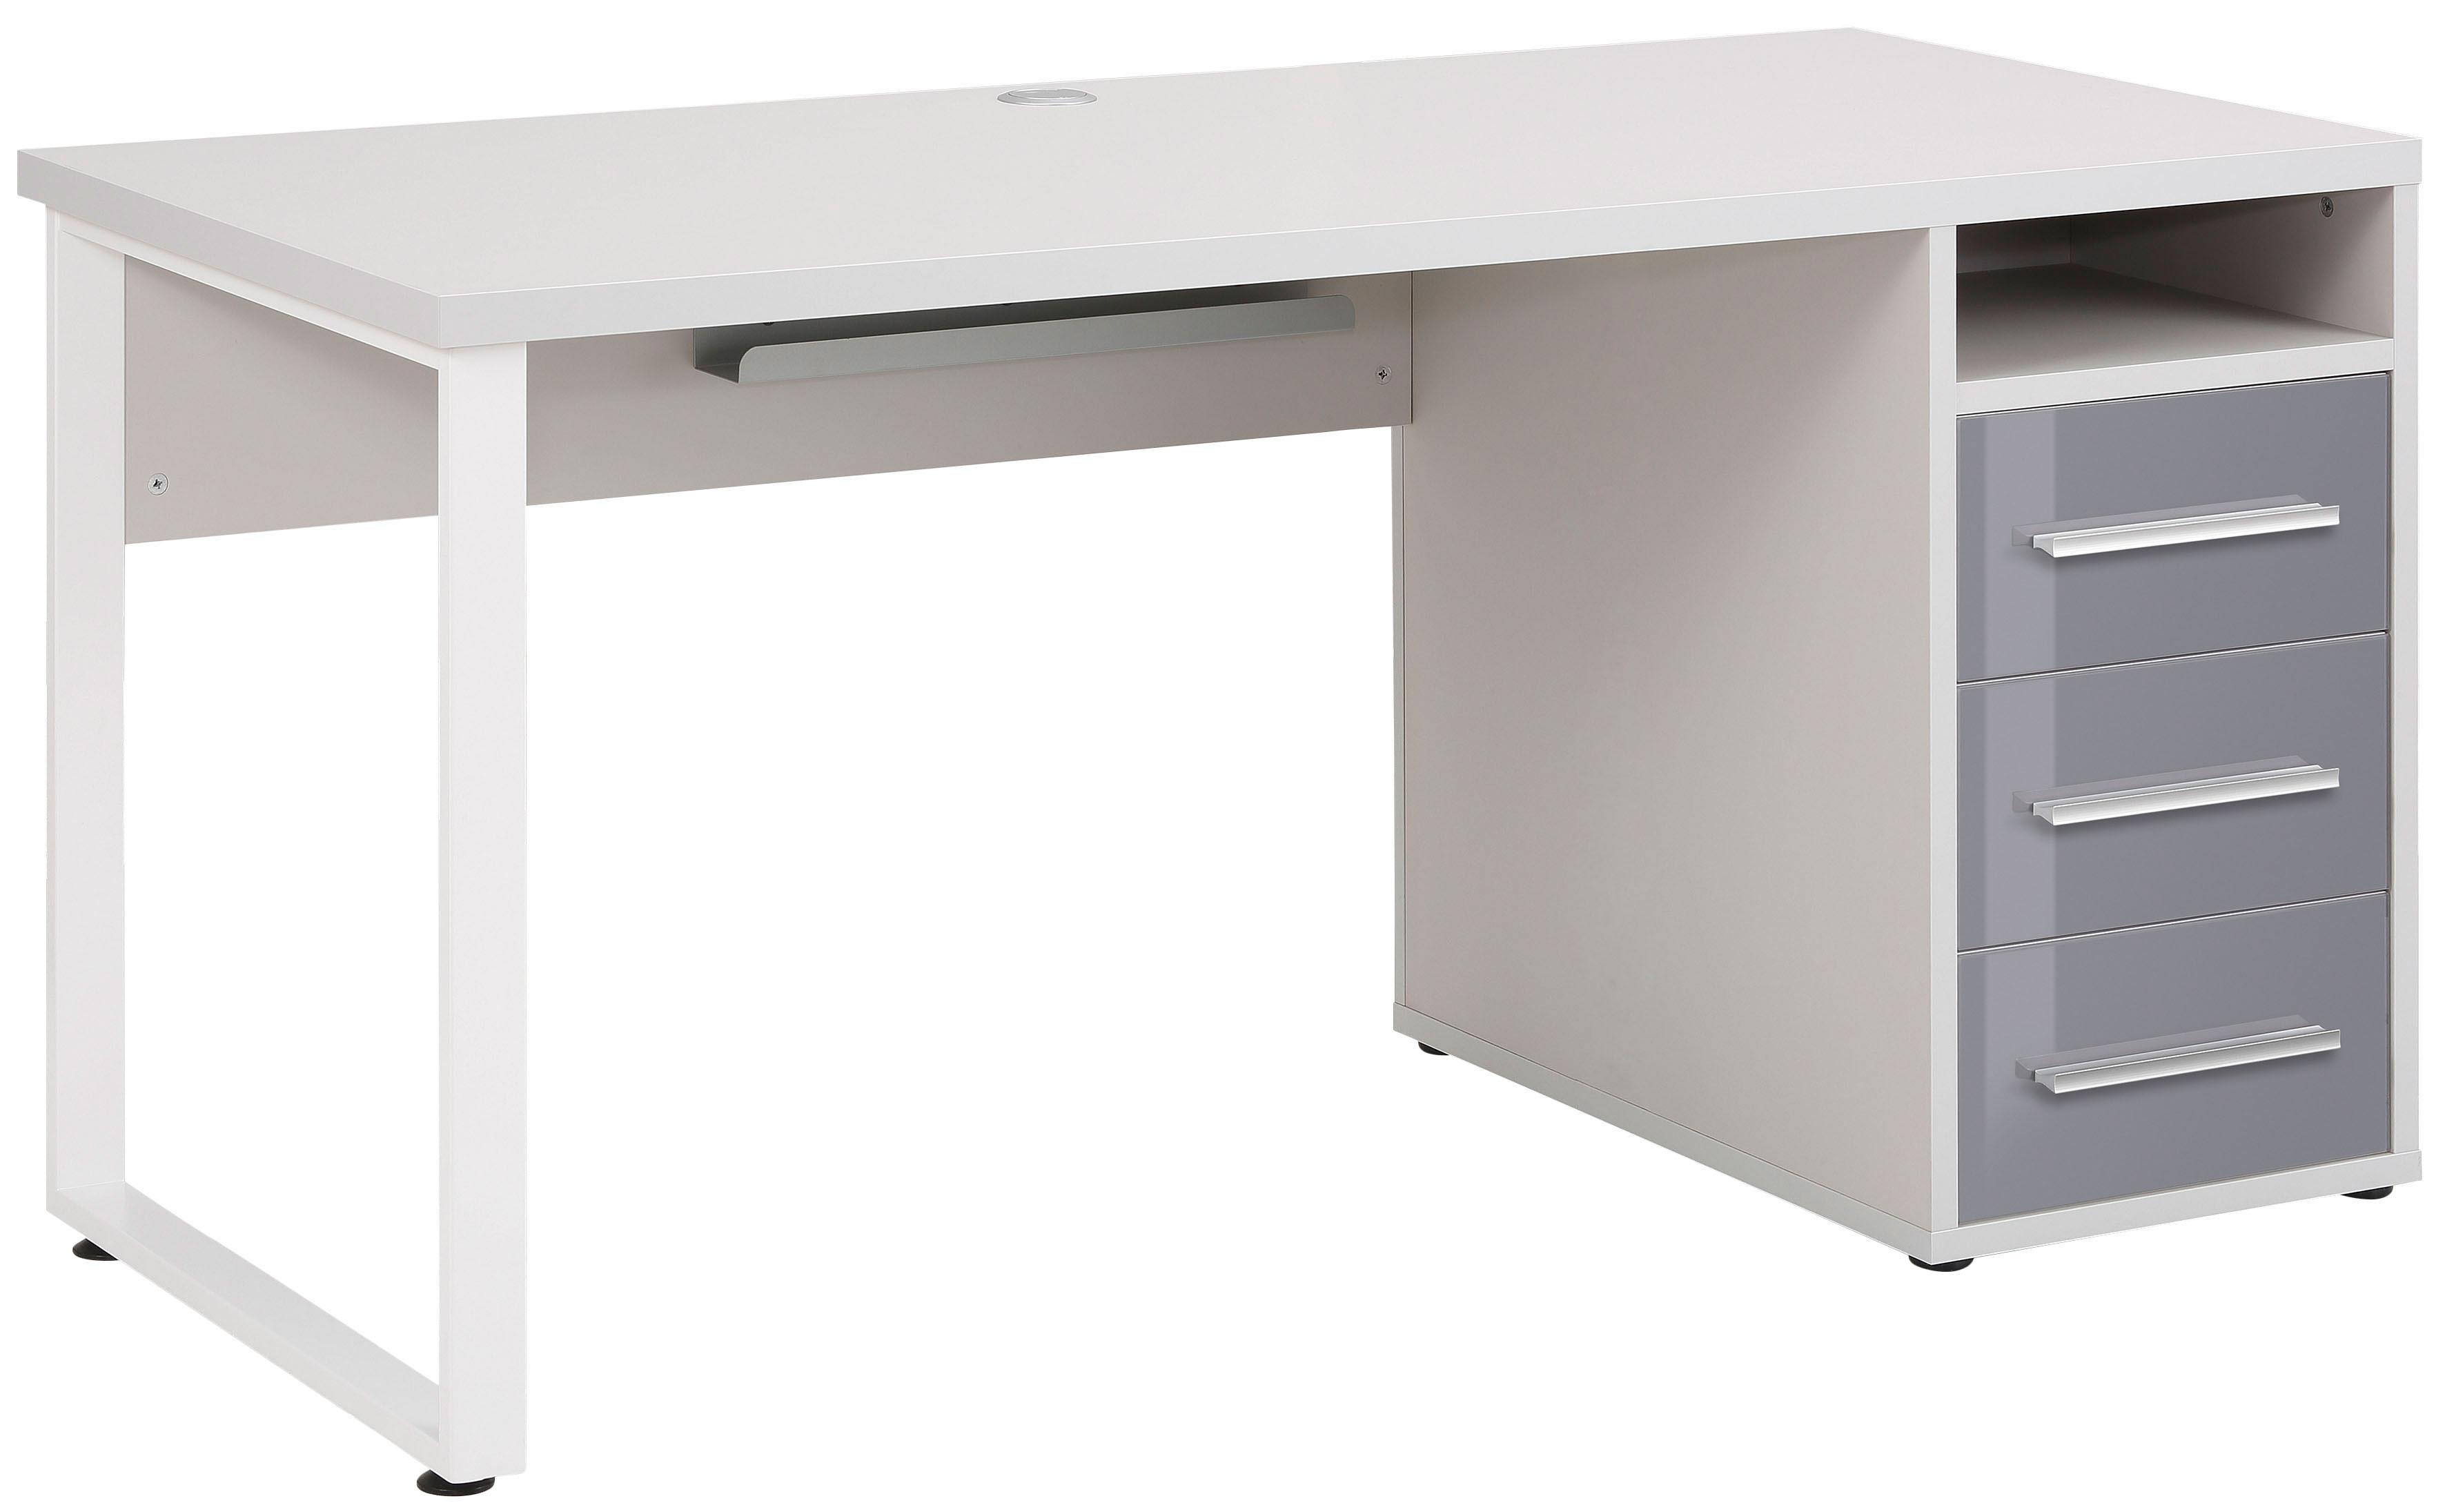 Bureau droit design gris platine/verre gris Esteban I